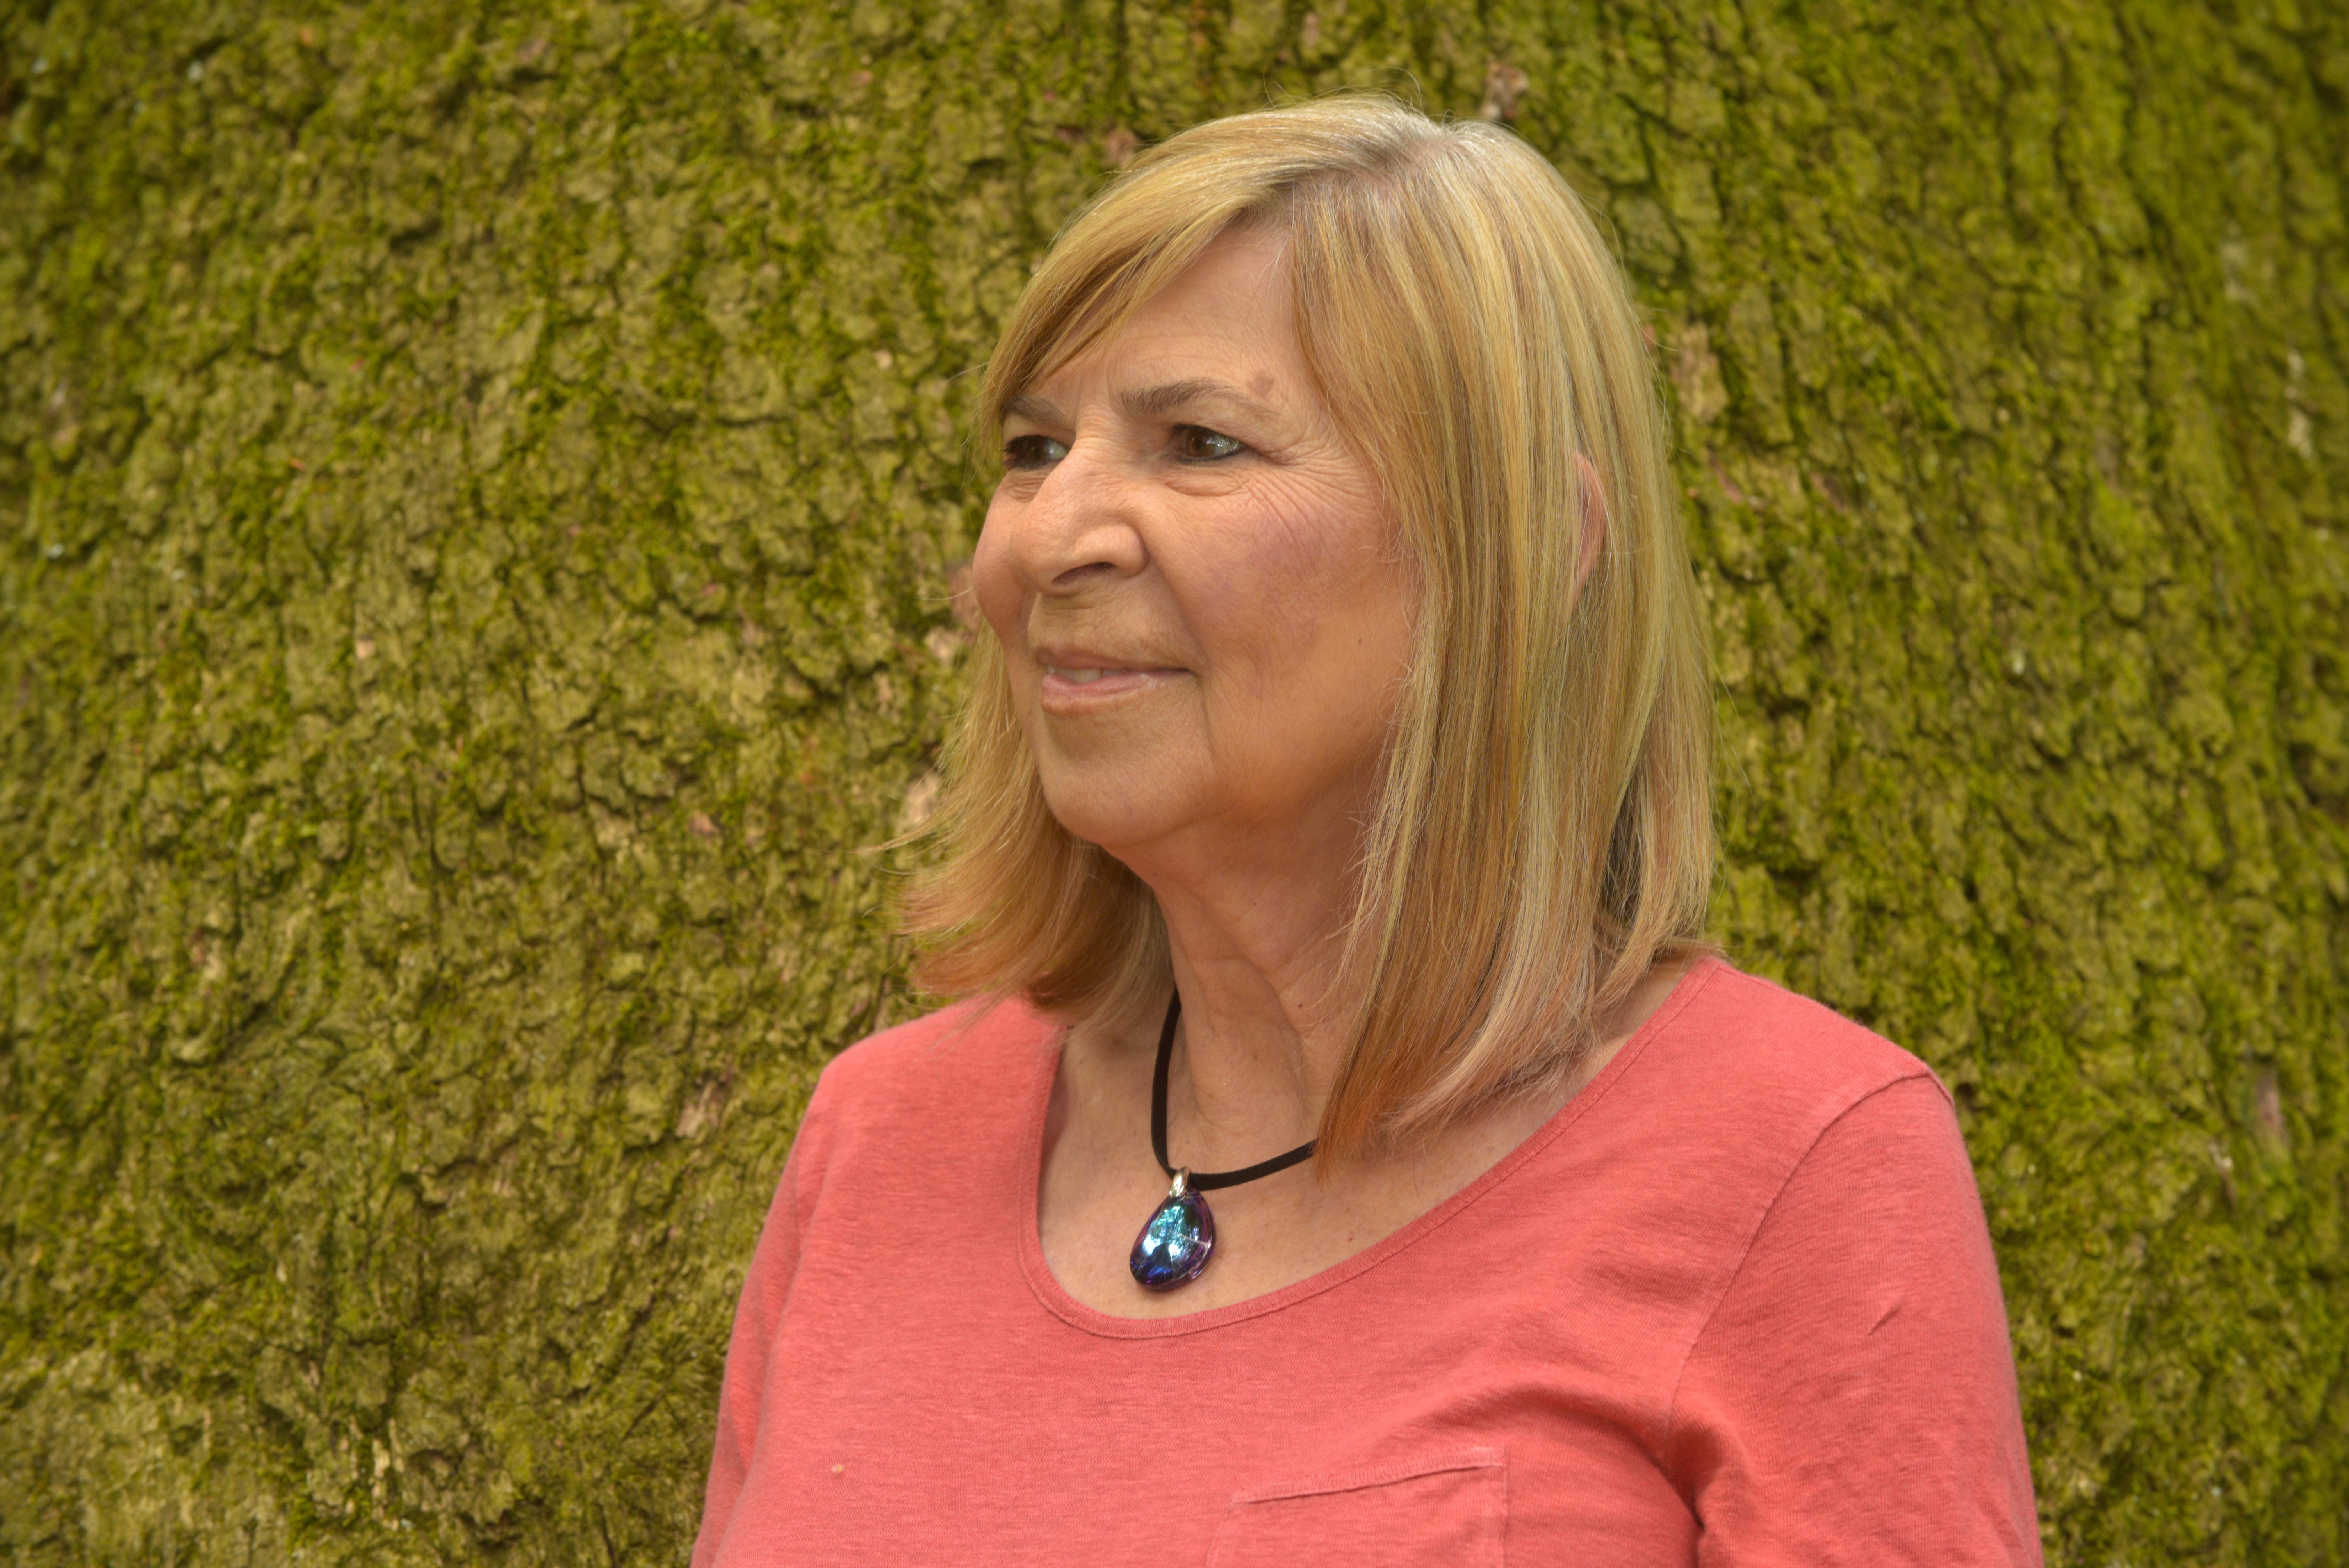 Mary Wilson Matthews at Bushy Park, London